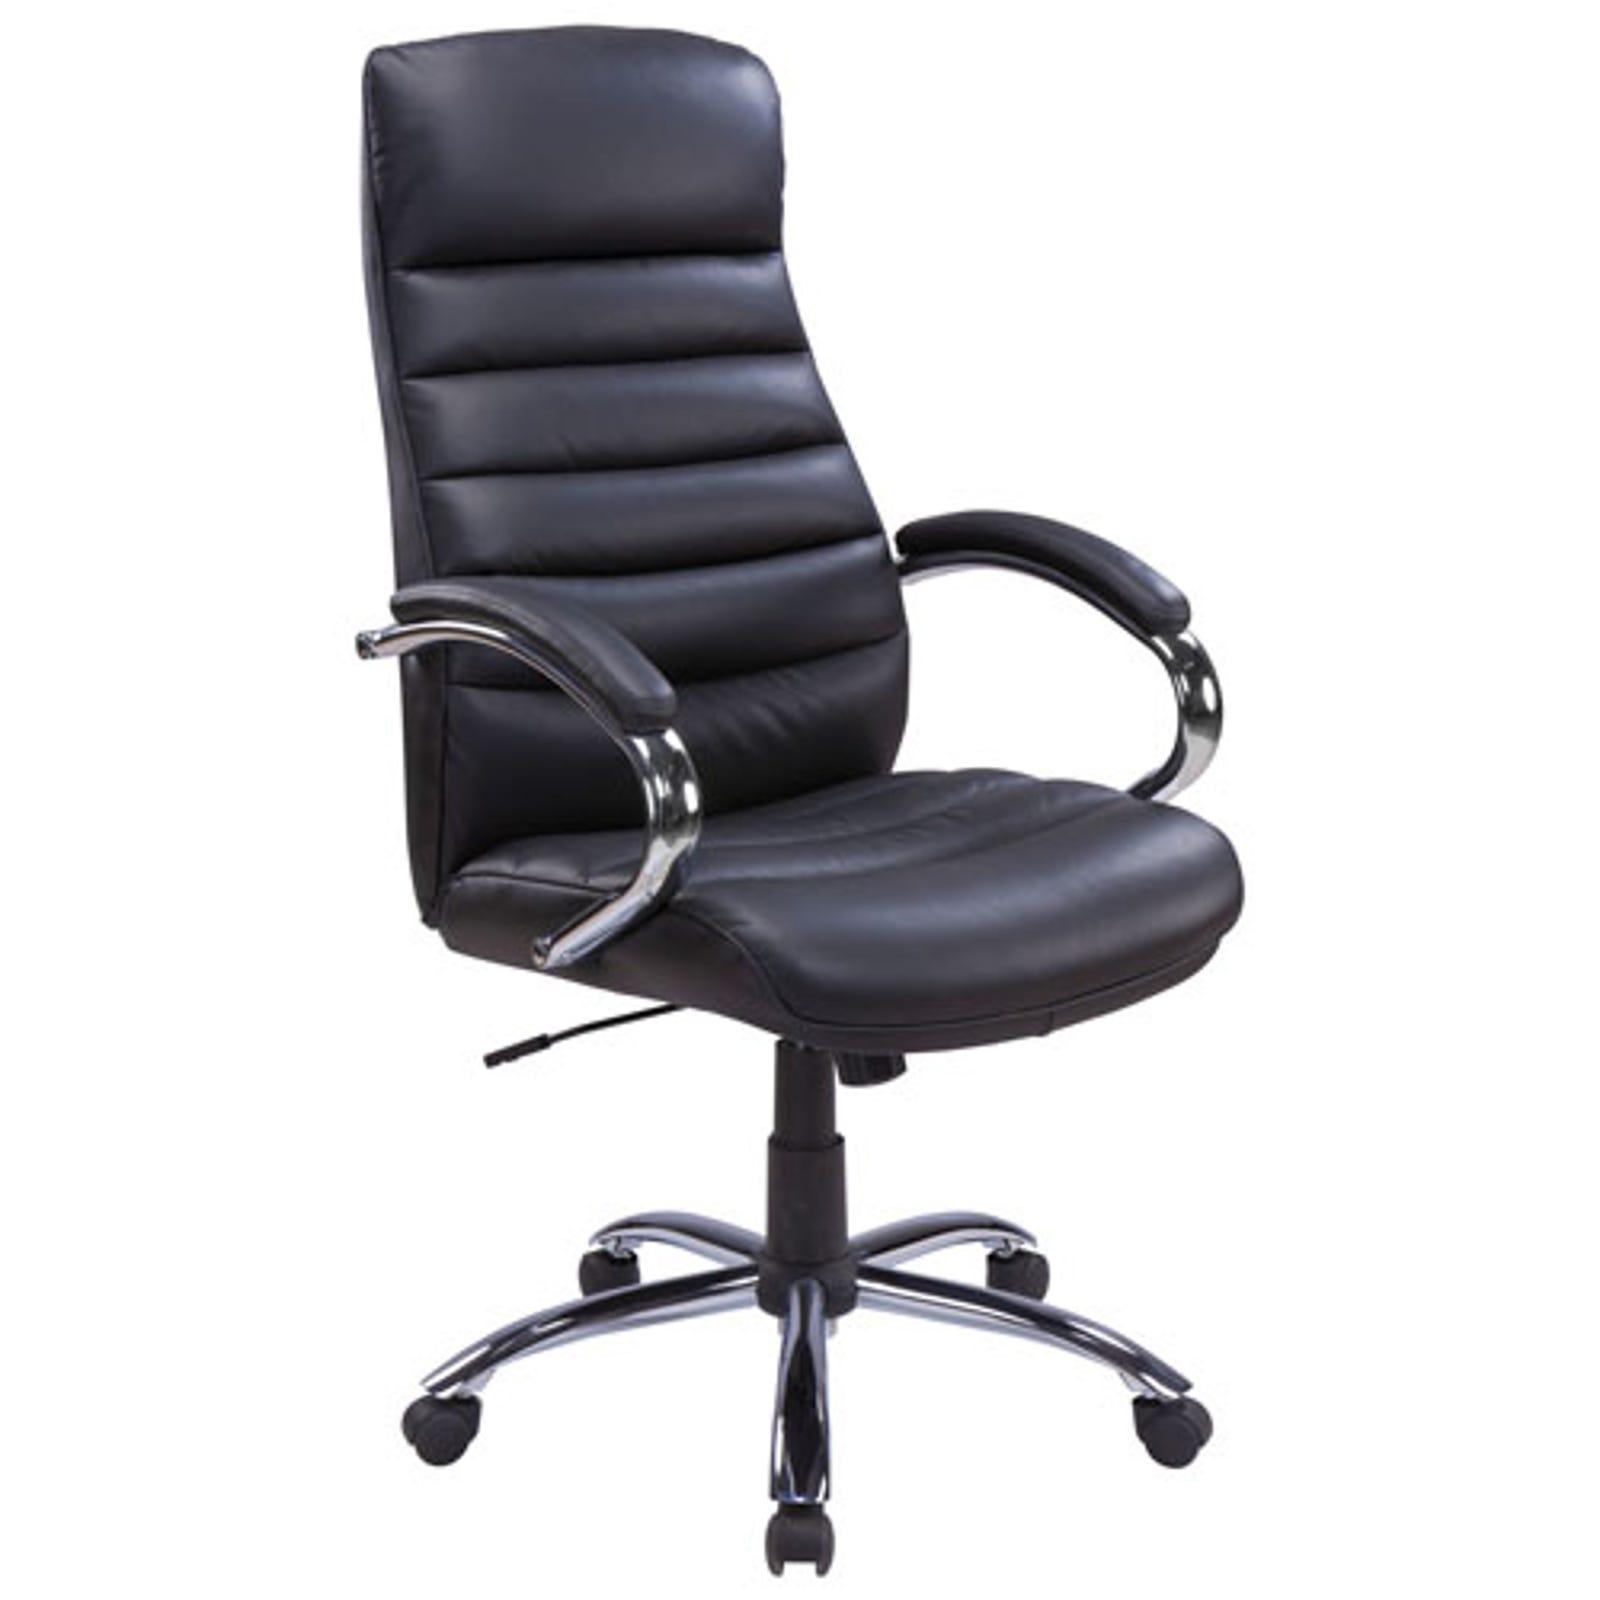 Wondrous Office Chairs Ergonomic Computer Desk More Best Buy Best Image Libraries Weasiibadanjobscom